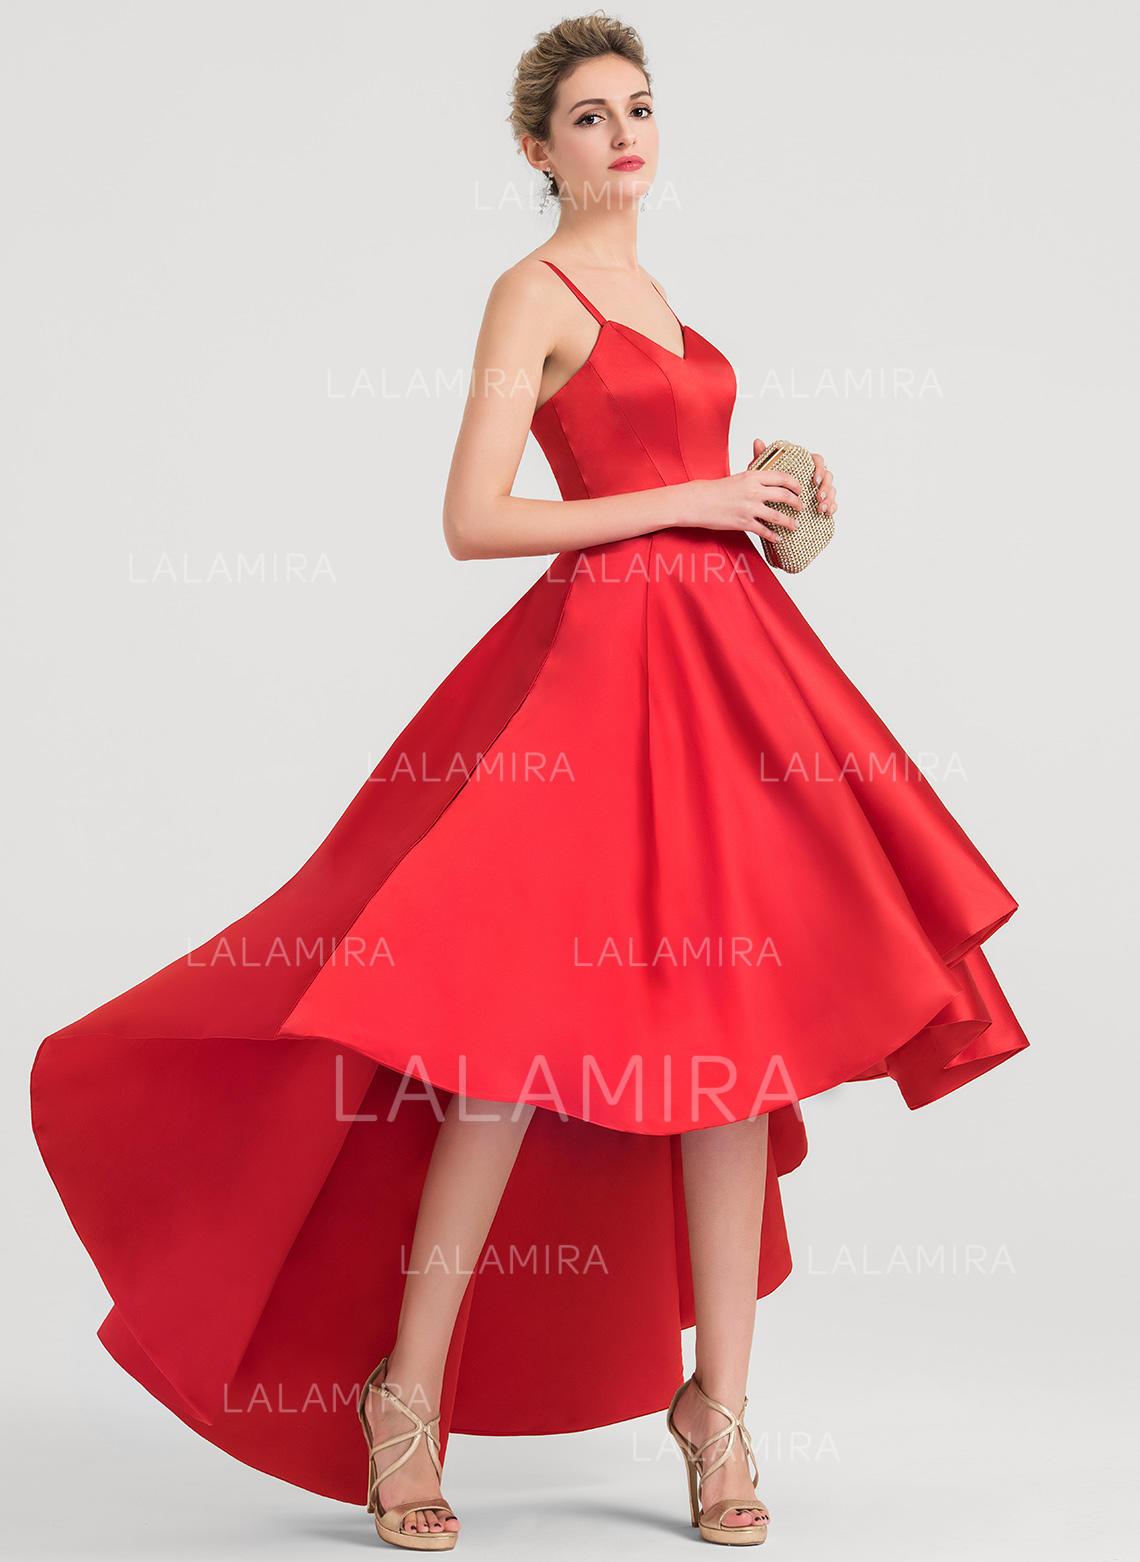 7c6a3006a0 A-Line Princess V-neck Asymmetrical Satin Prom Dresses (018157180). Loading  zoom